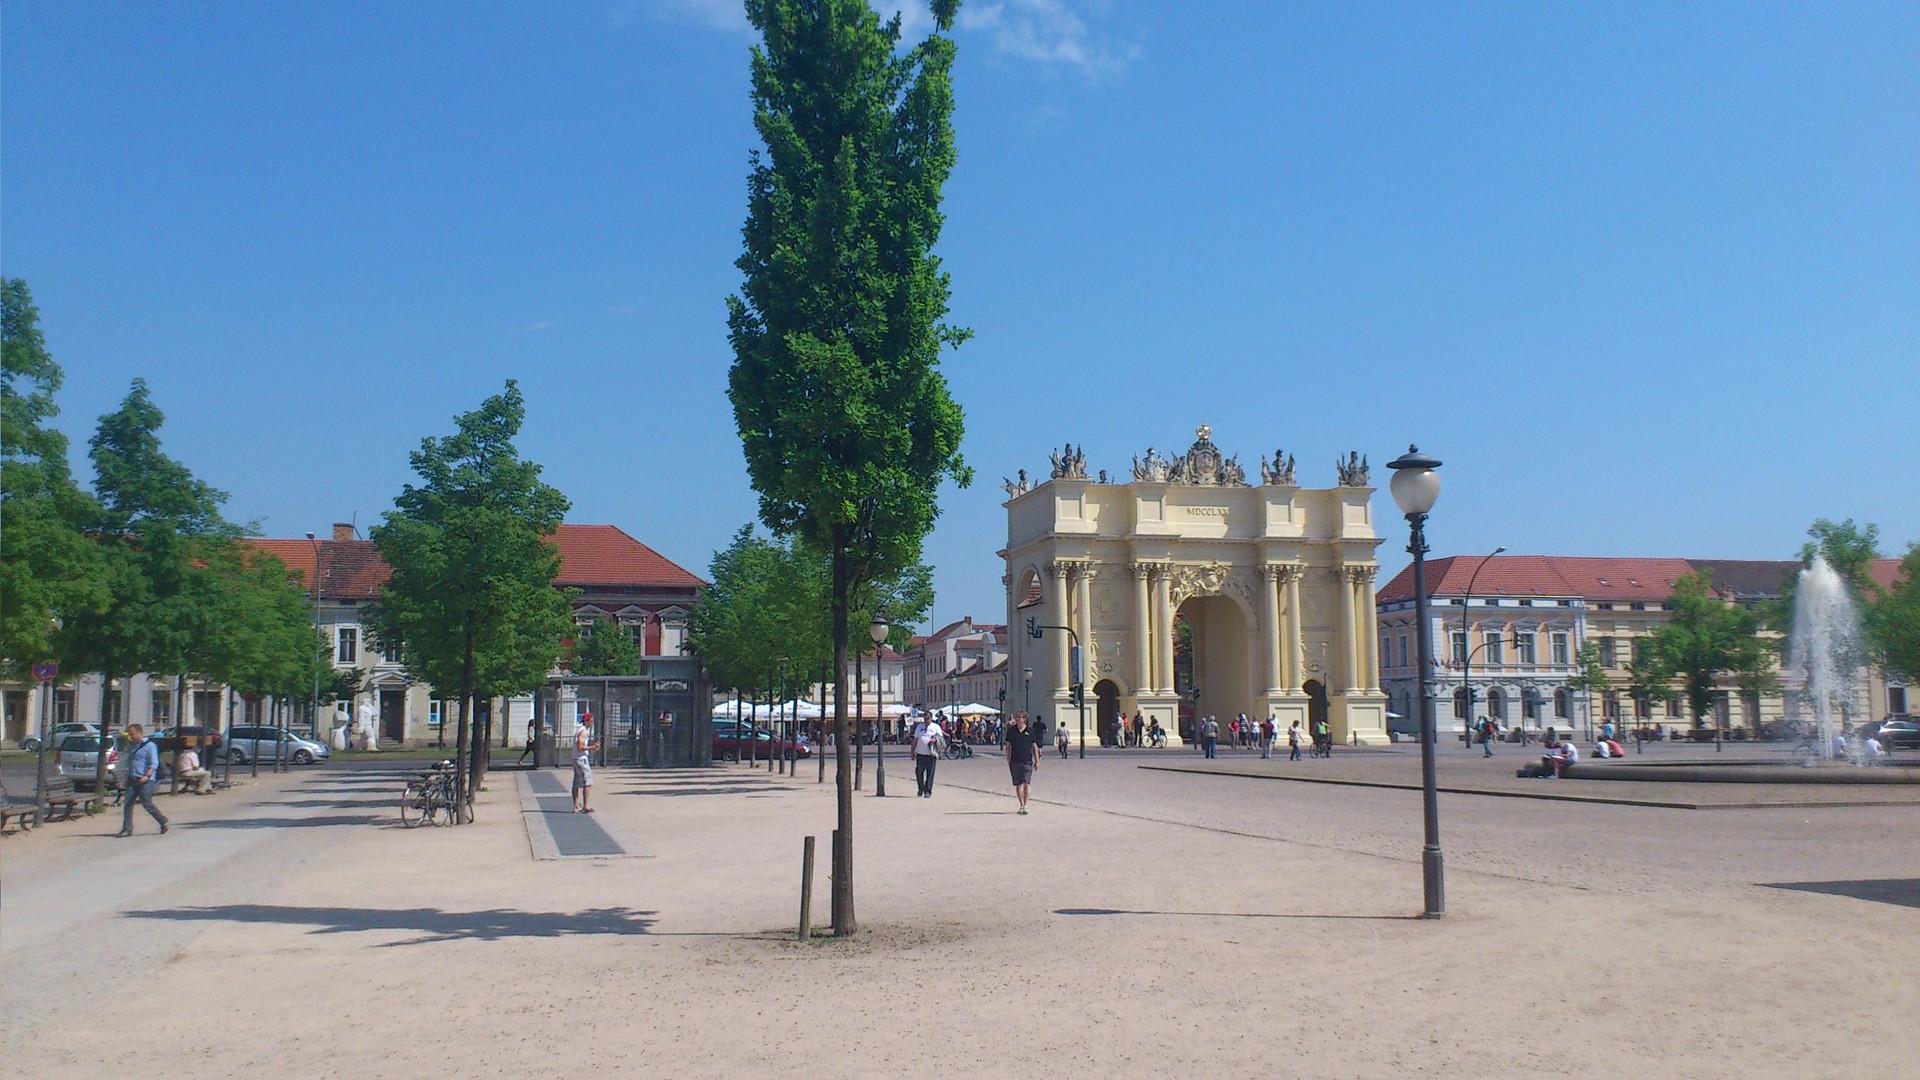 Luisenplatz Brandenburger Tor Potsdam